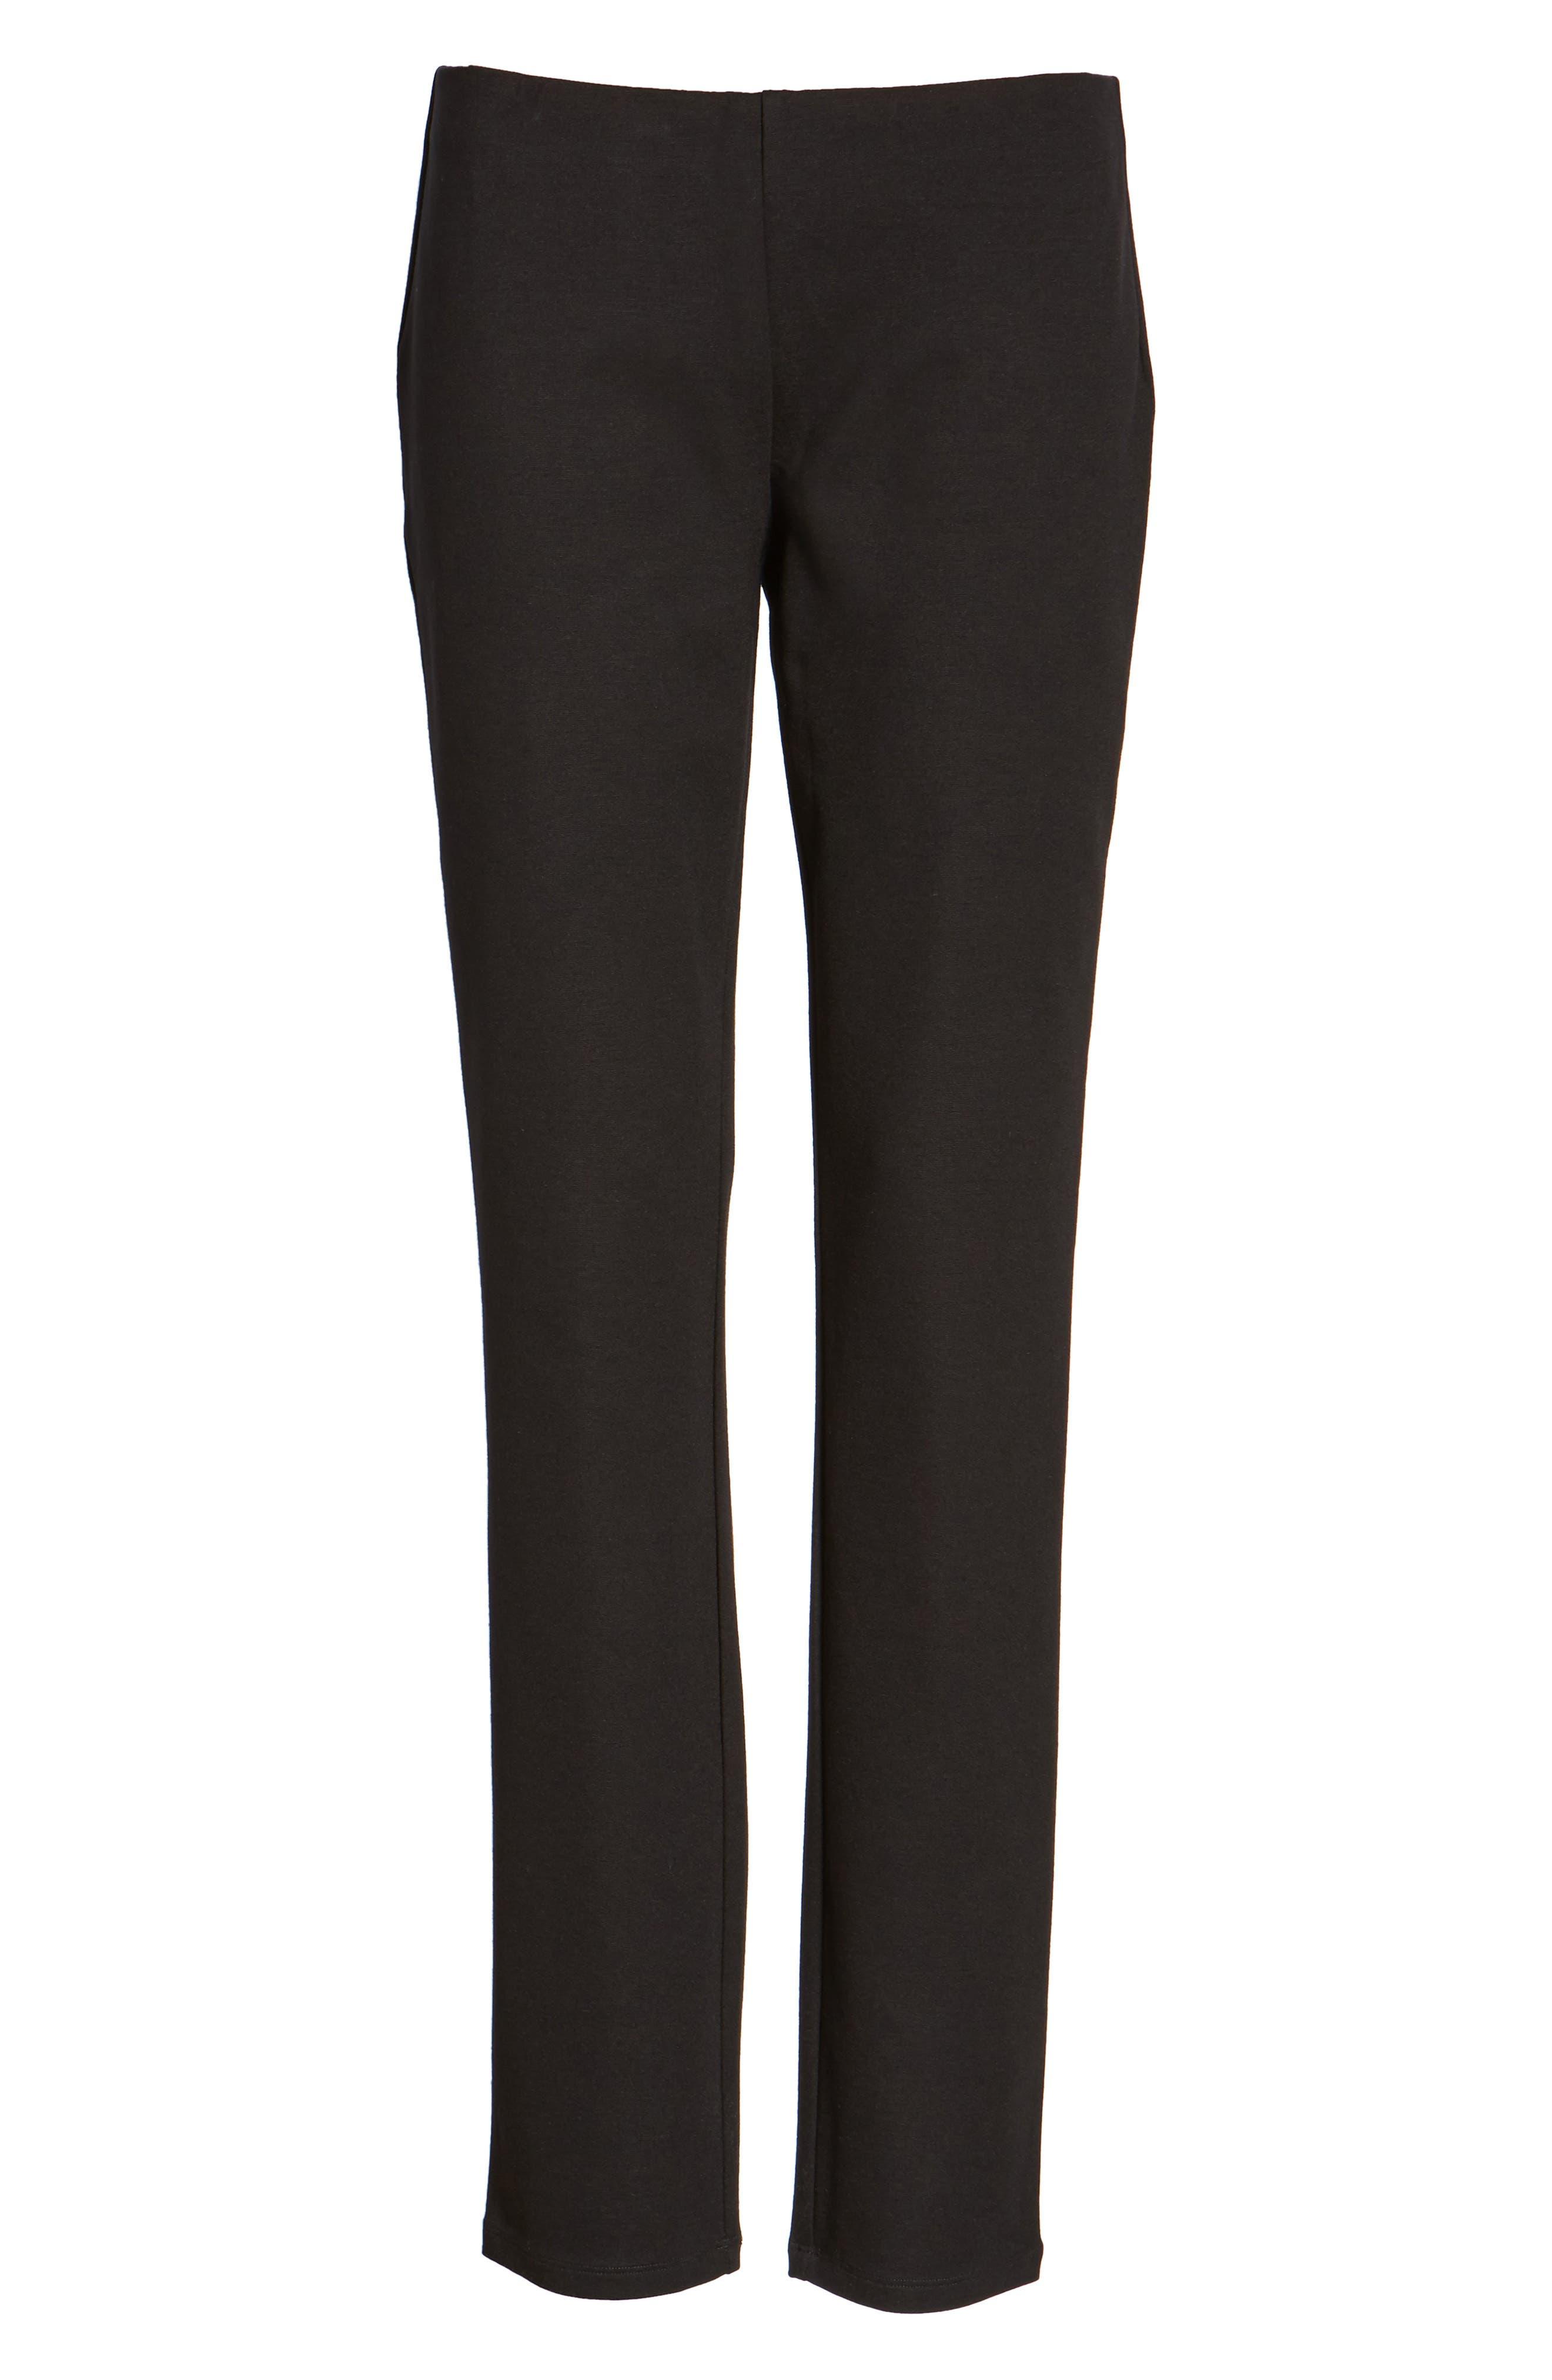 EILEEN FISHER Slim Ponte Knit Pants, Main, color, BLACK